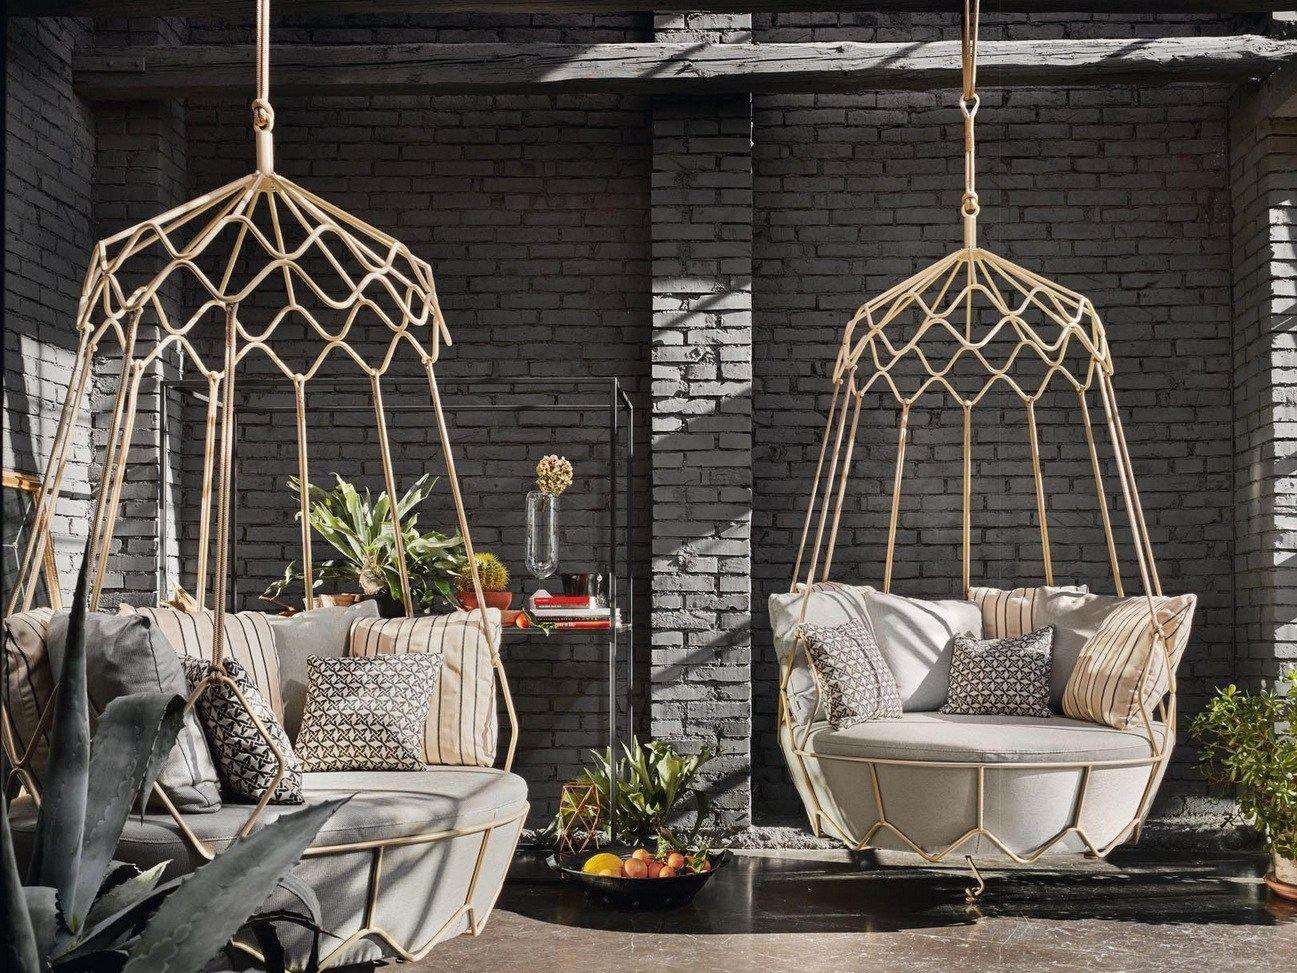 GRAVITY Garden Hanging Chair By Roberti Rattan Design Technical Emotions